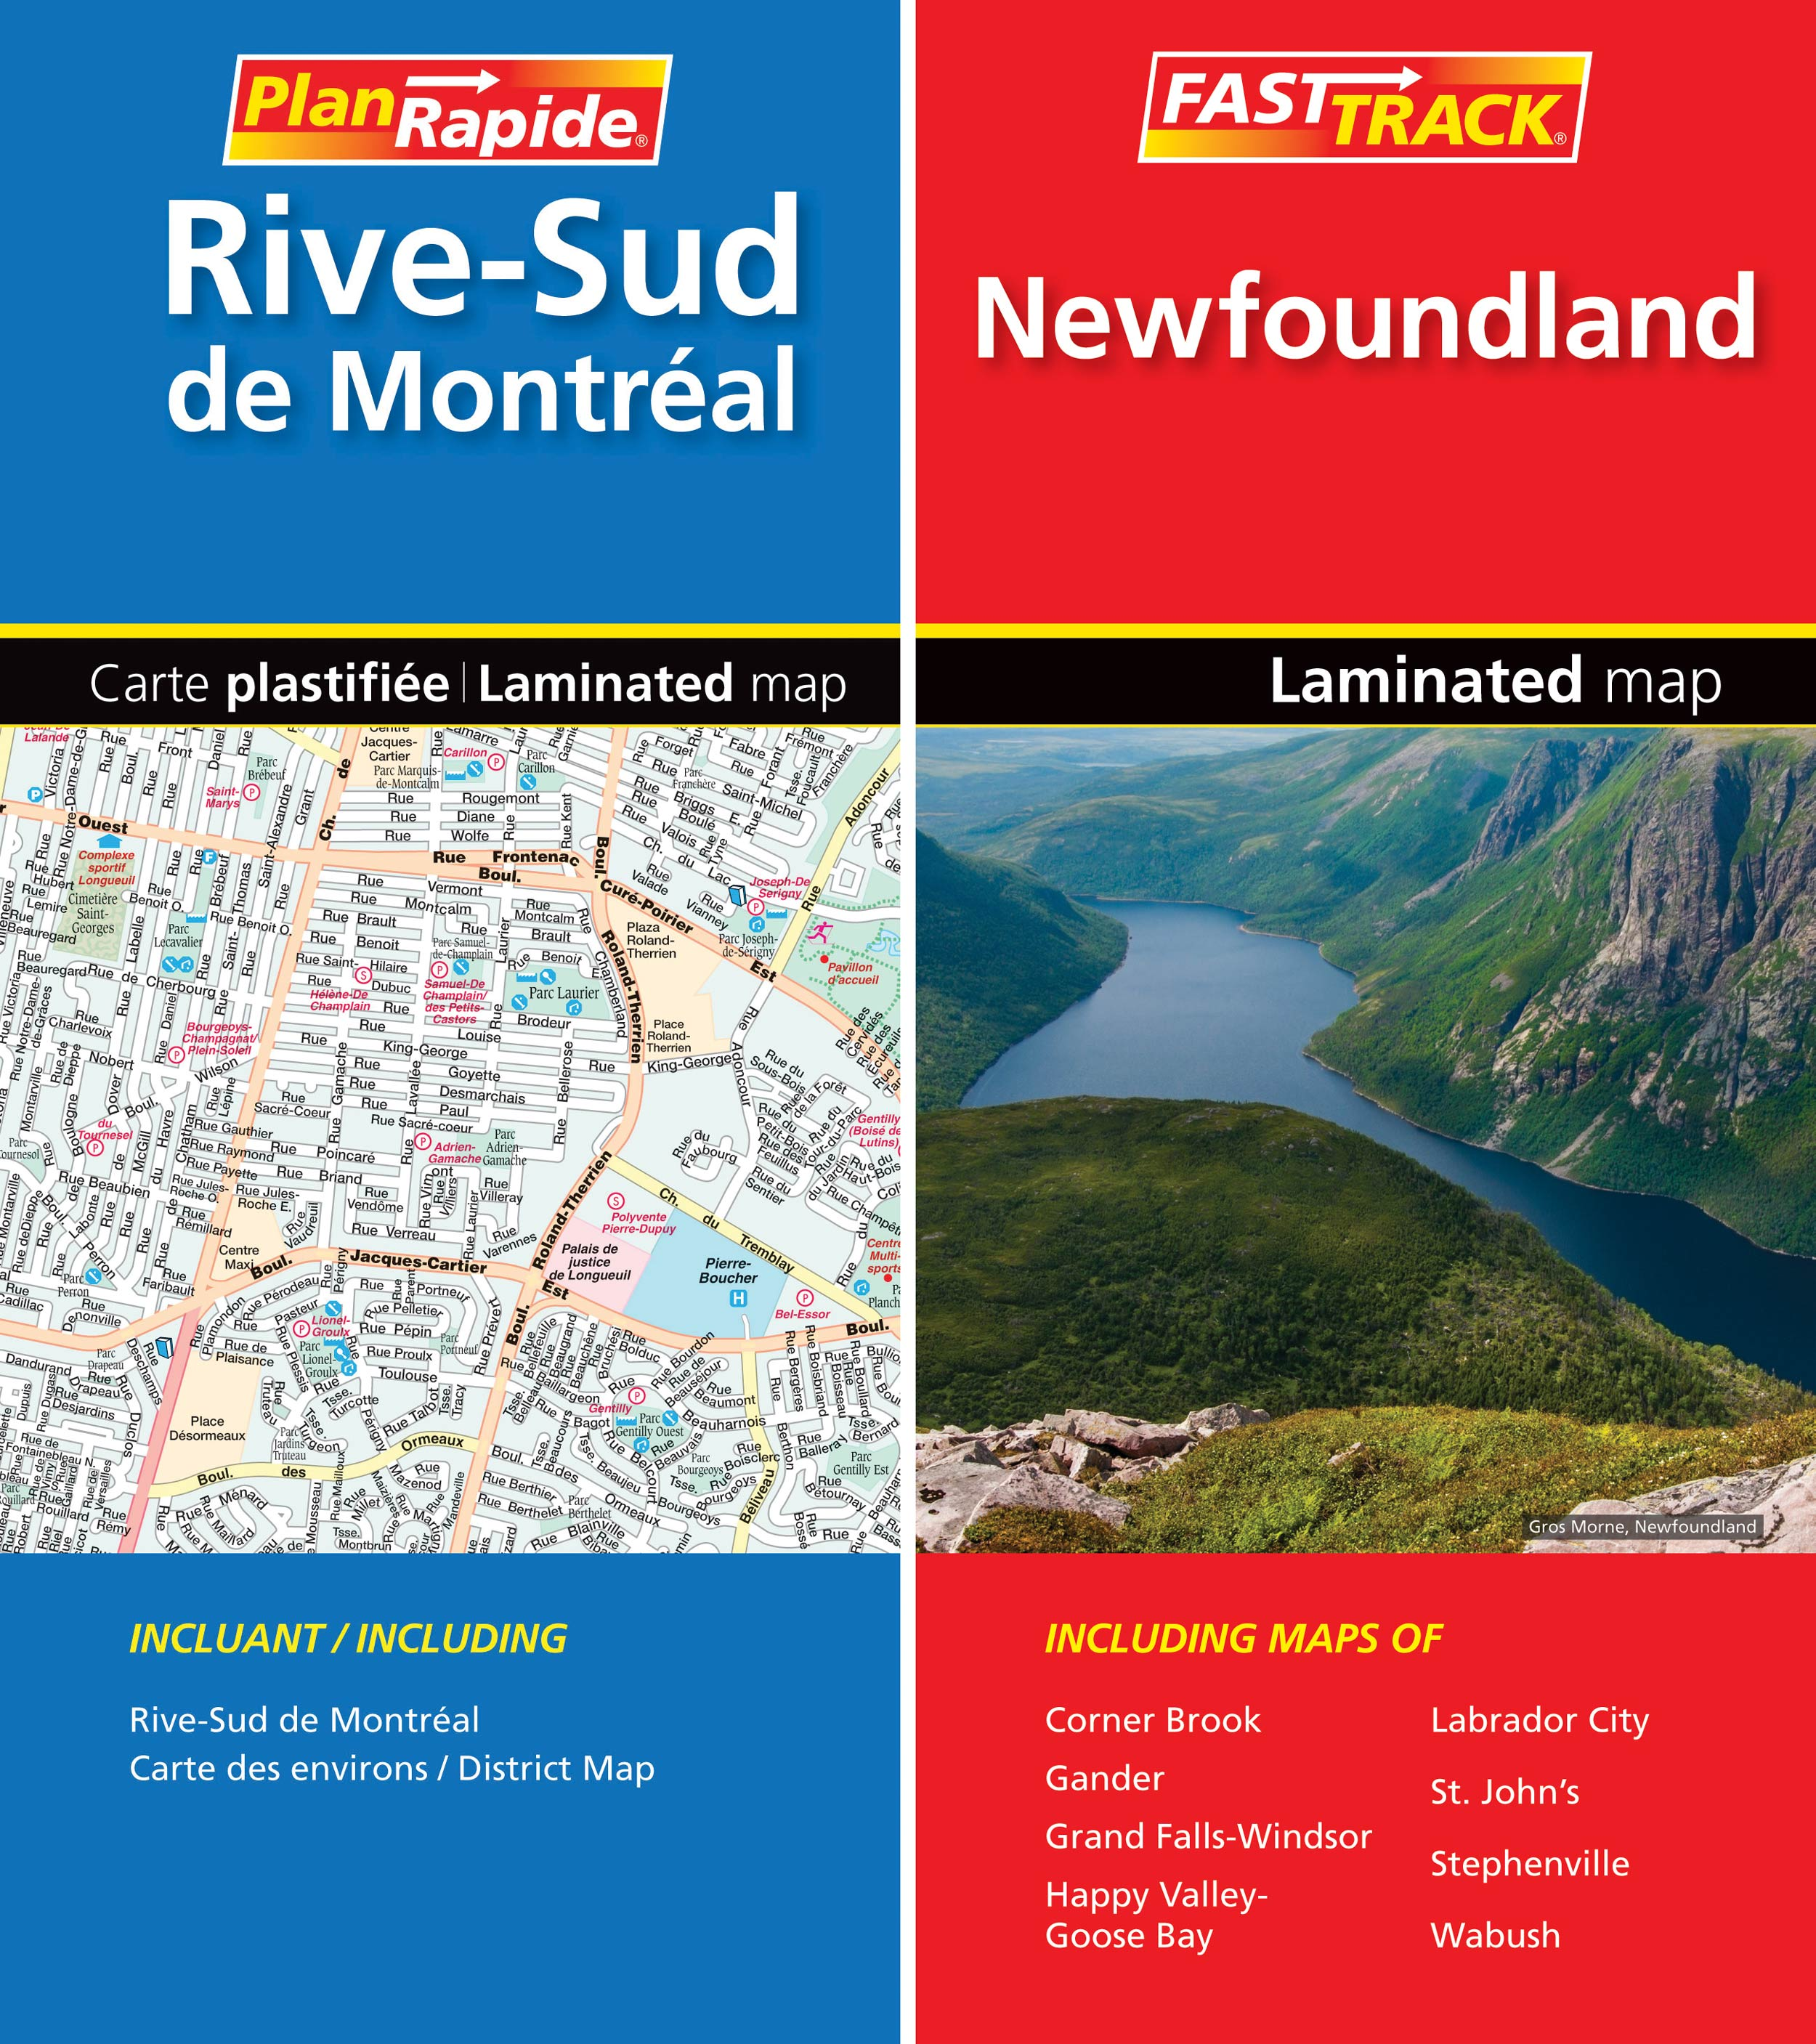 cccmaps   CCCMaps.com Canada's Map Company   Page 7 on